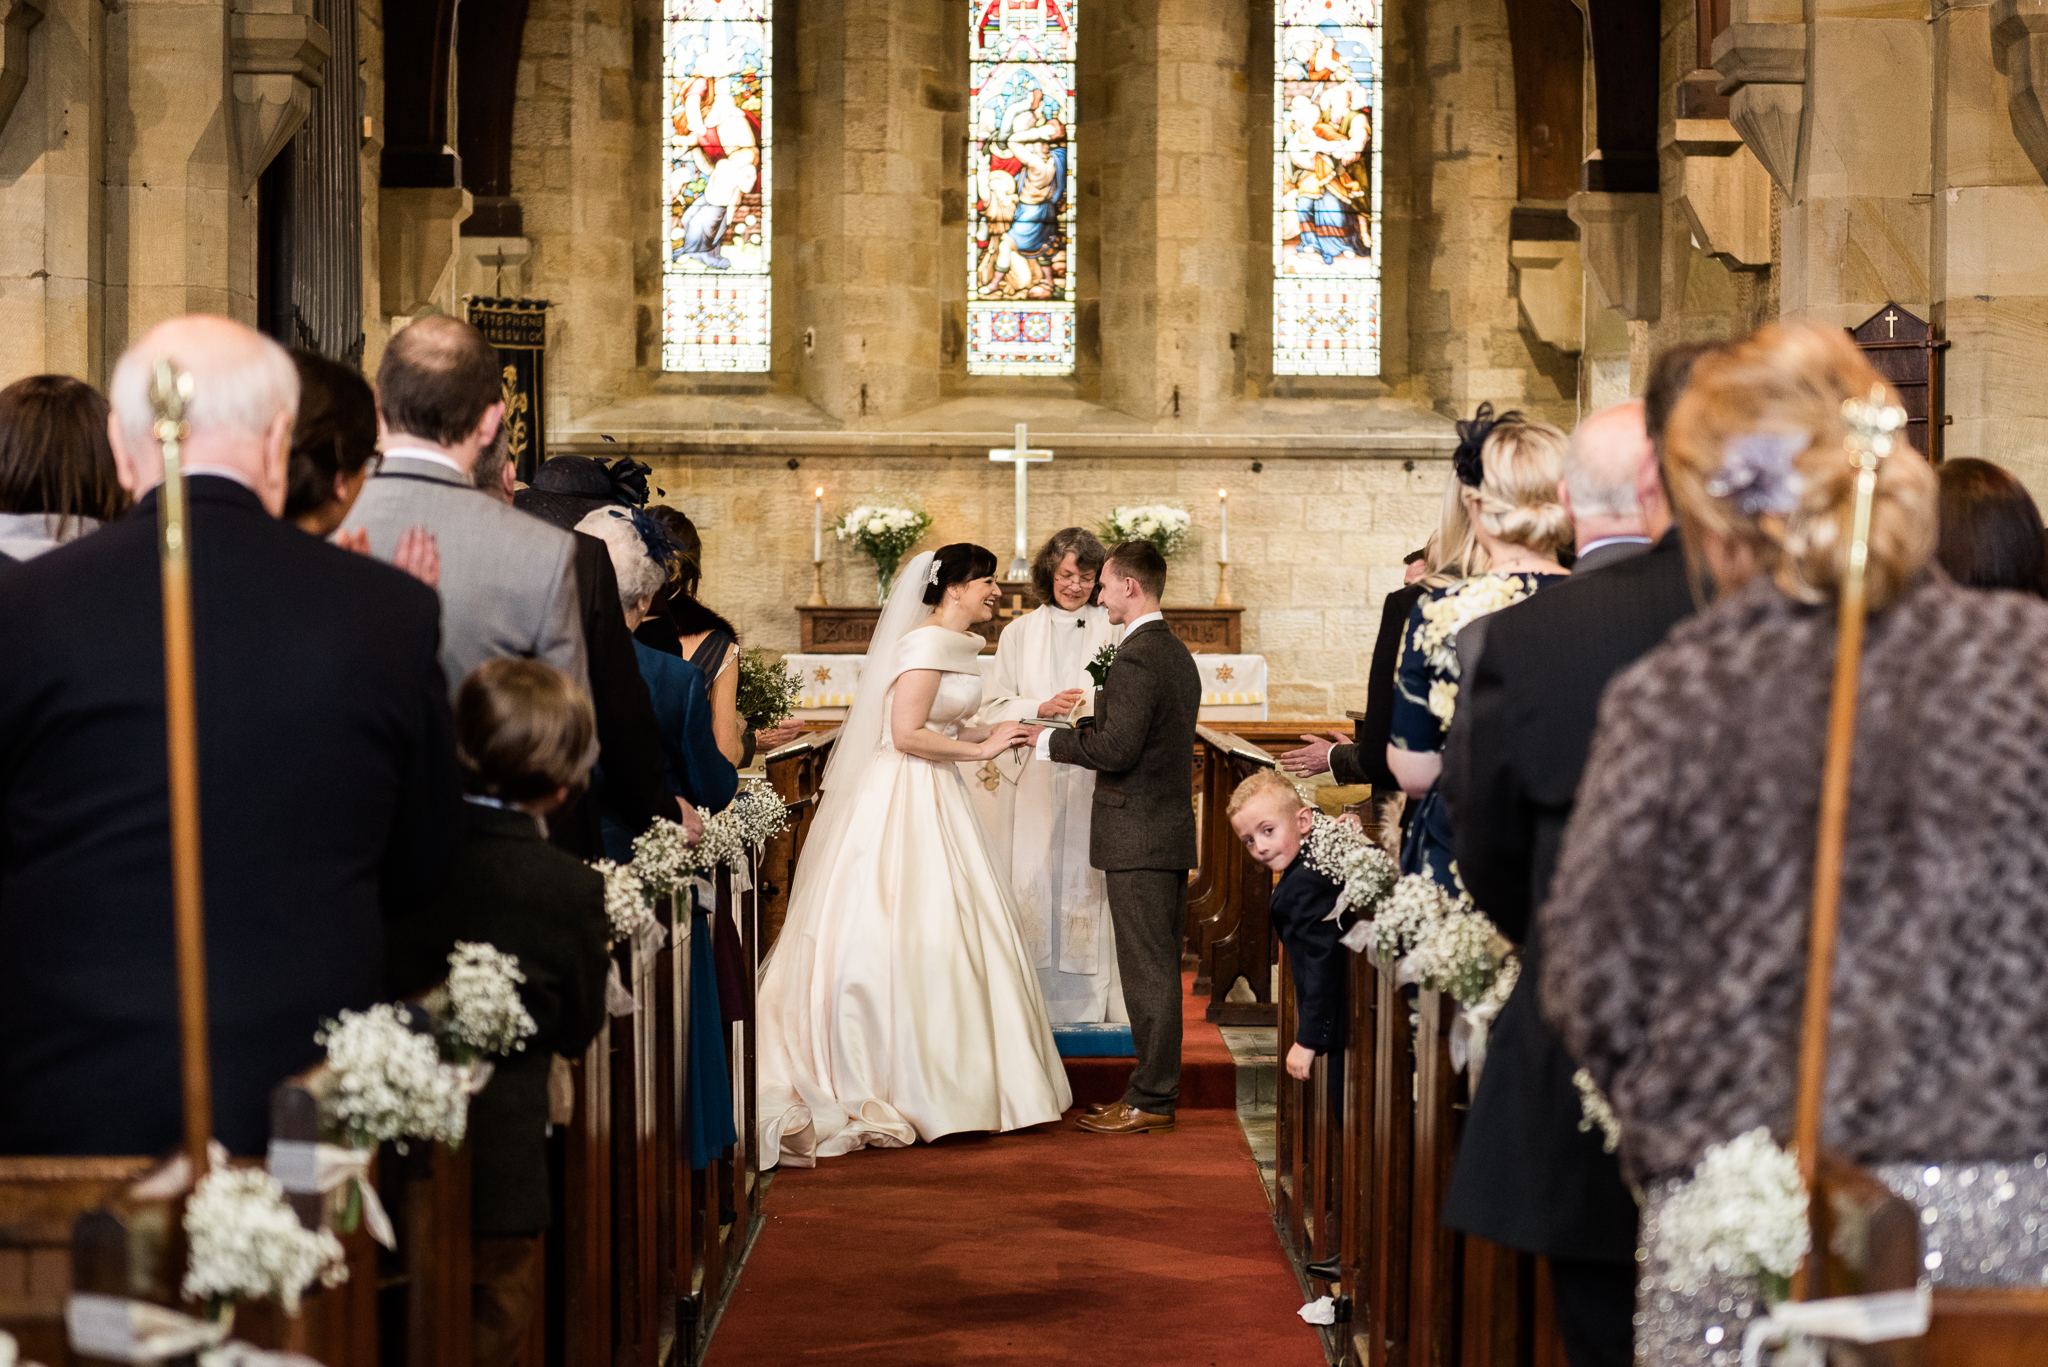 Yorkshire Wedding Photography Spring Wedding Cubley Hall Rustic Barn-26.jpg